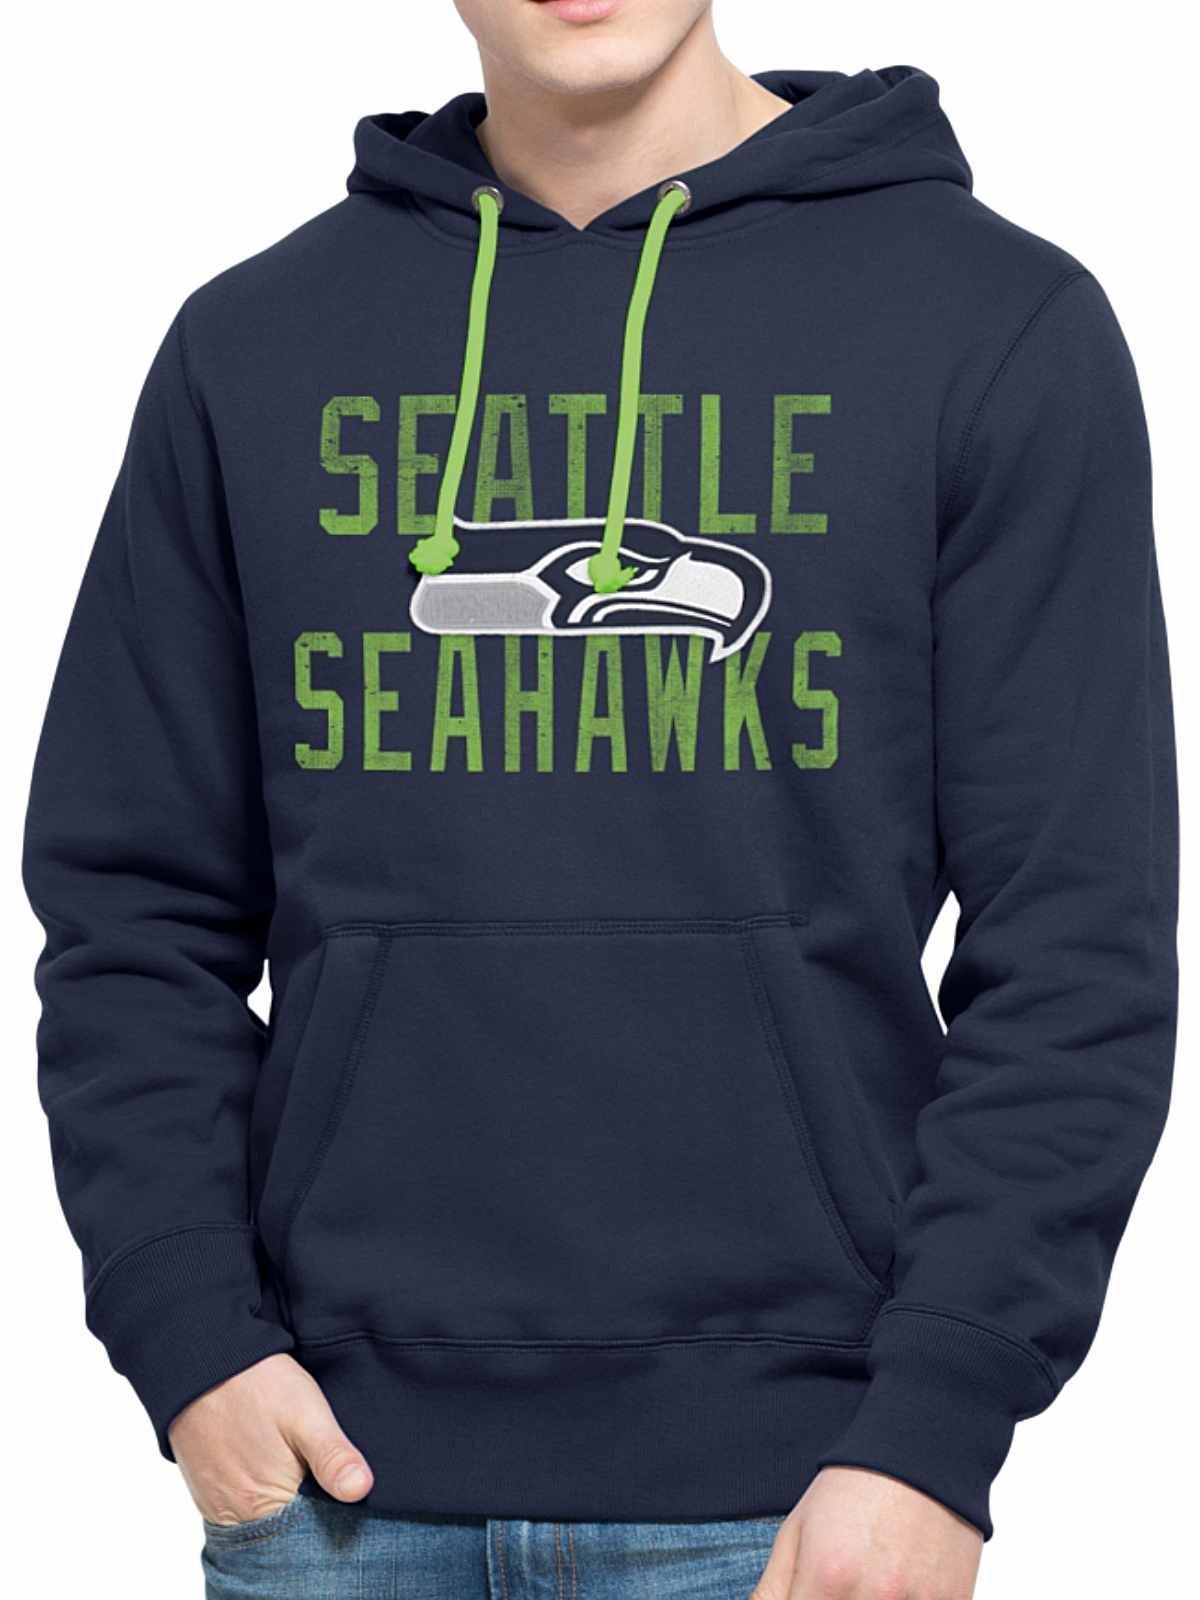 98bc73950 Seattle Seahawks 47 Brand Navy Cross-Check Pullover Hoodie Sweatshirt